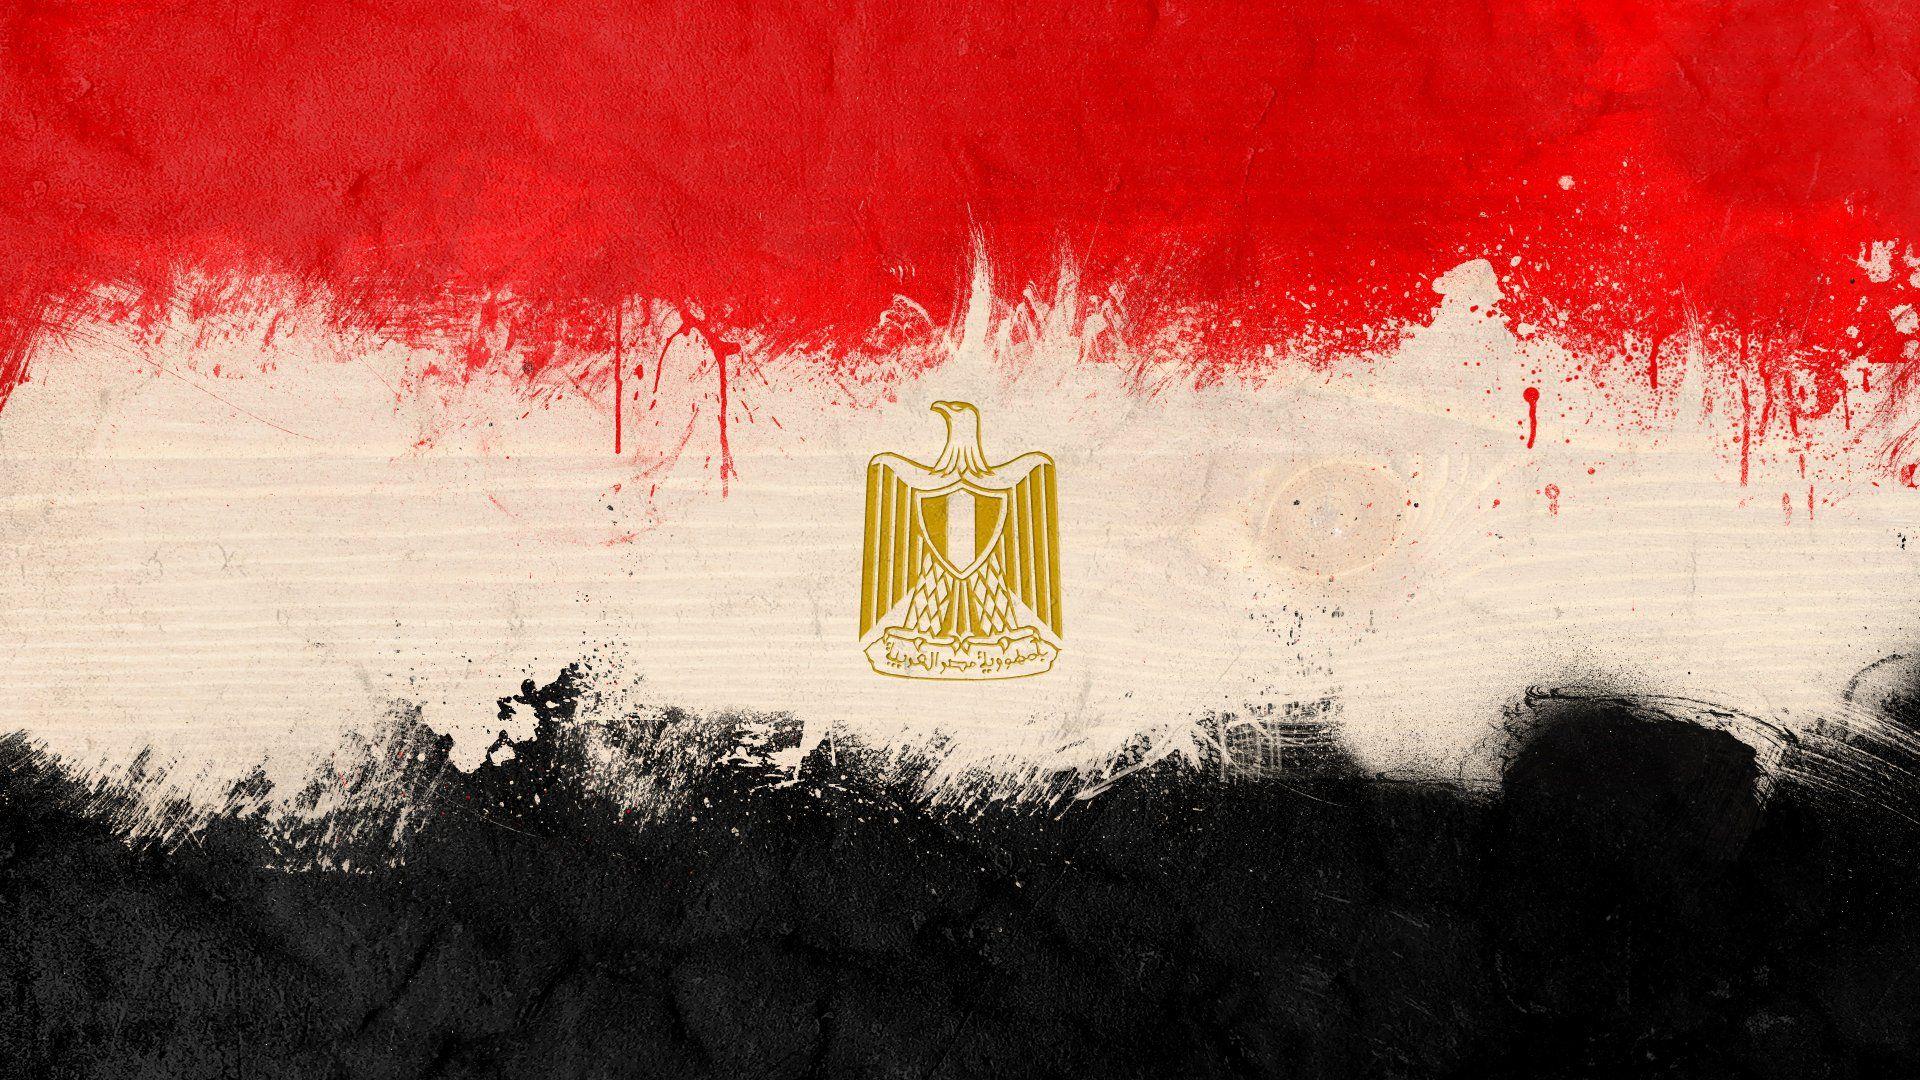 egpyt flag images